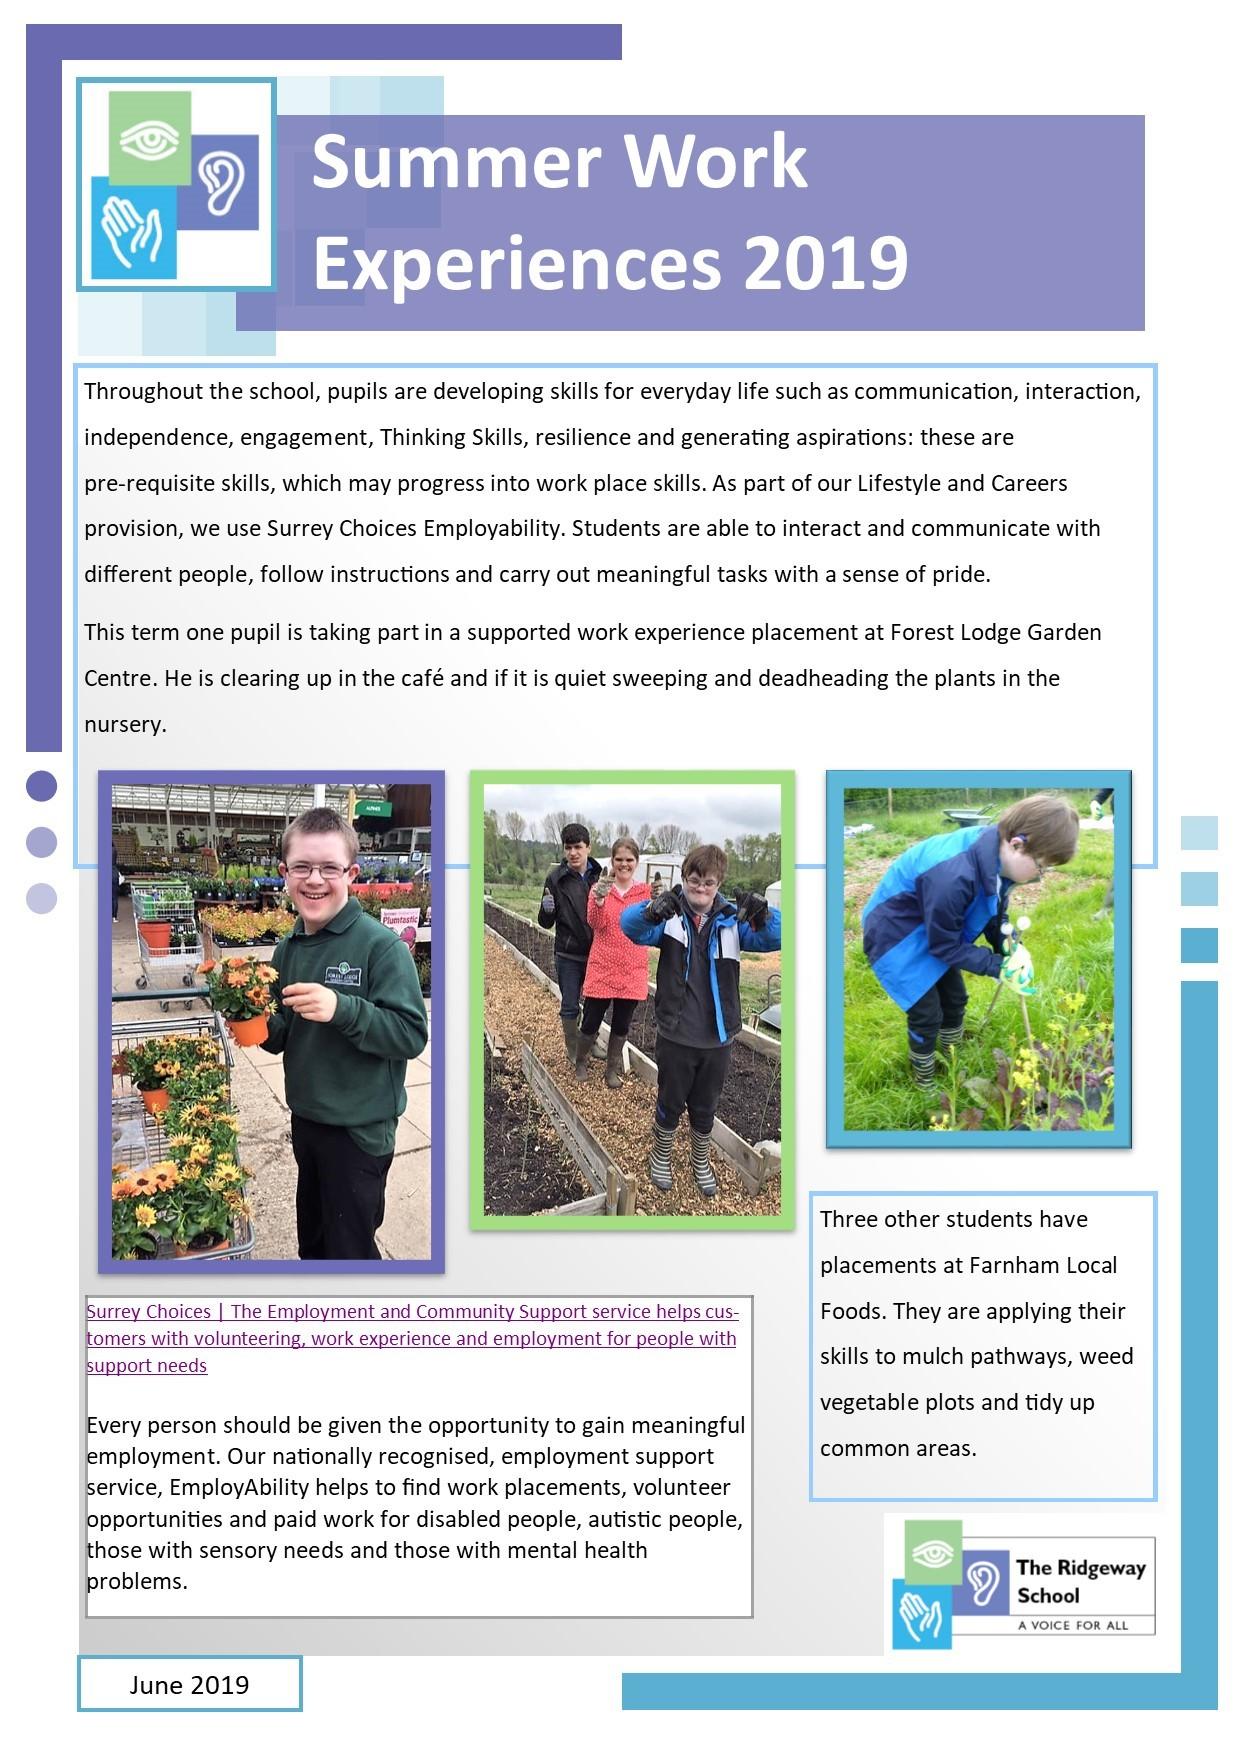 Summer Work Experiences 2019